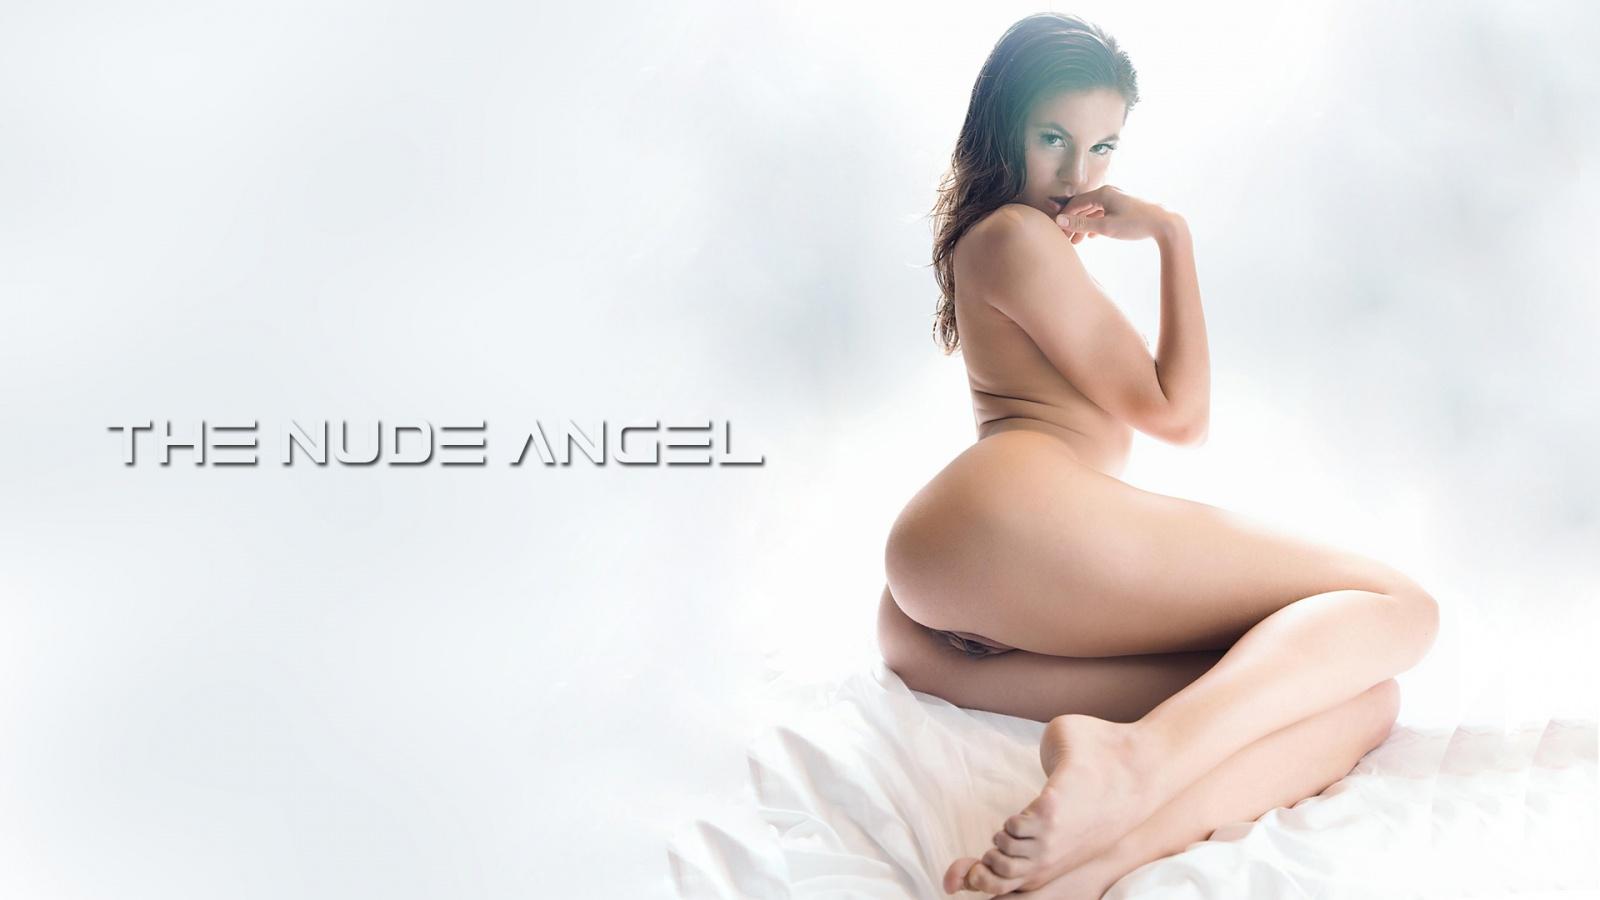 Parts To The Camera Hot Desktop Nude Models And Pornstars Wallpapers